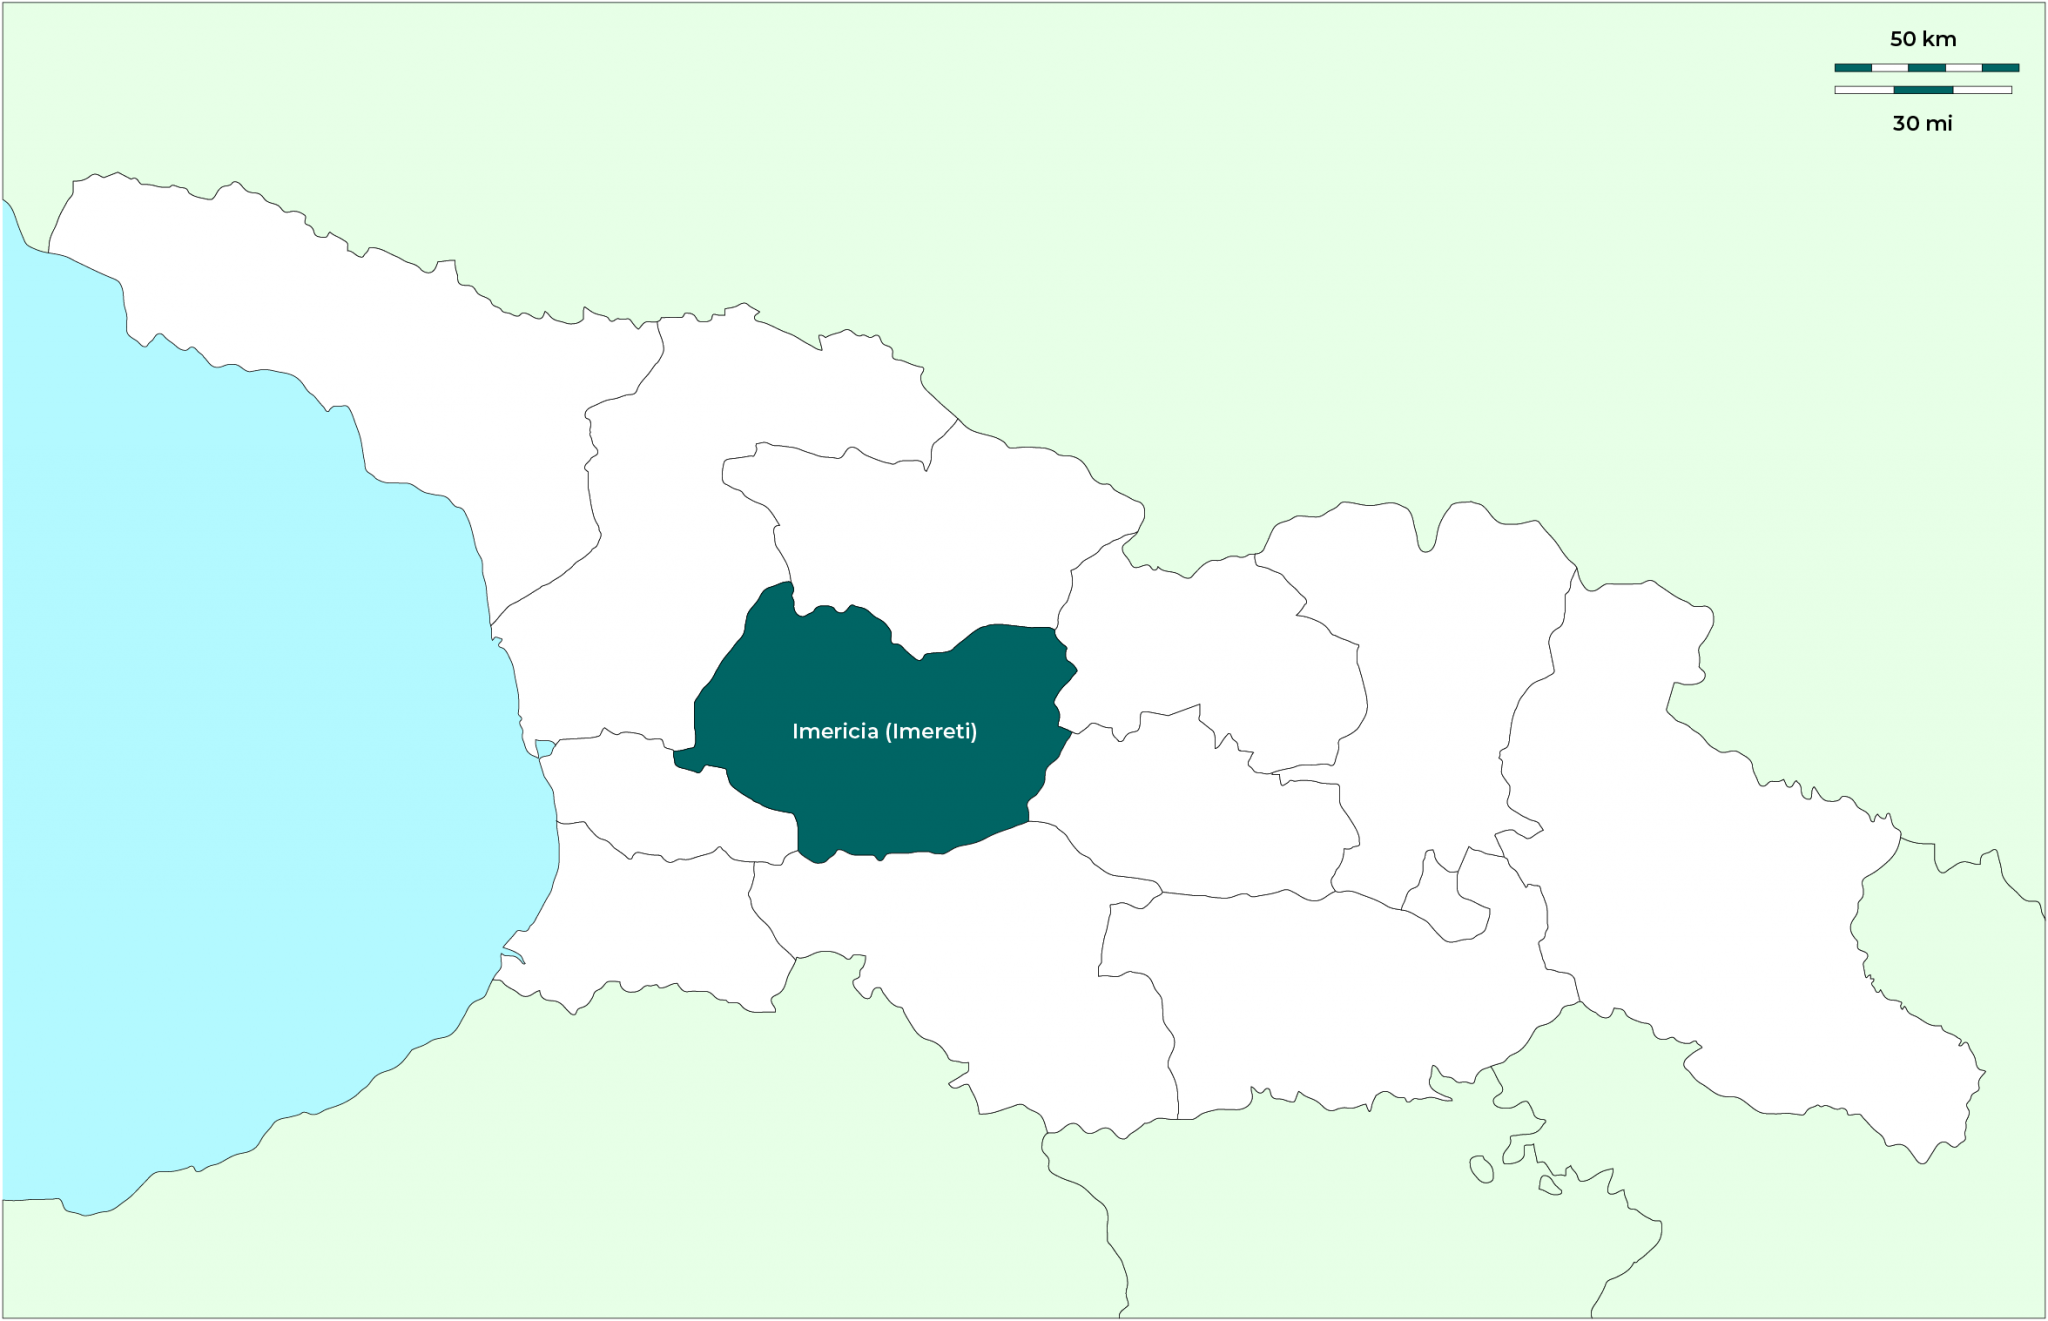 Región de Imericia (Imereti): Mapa